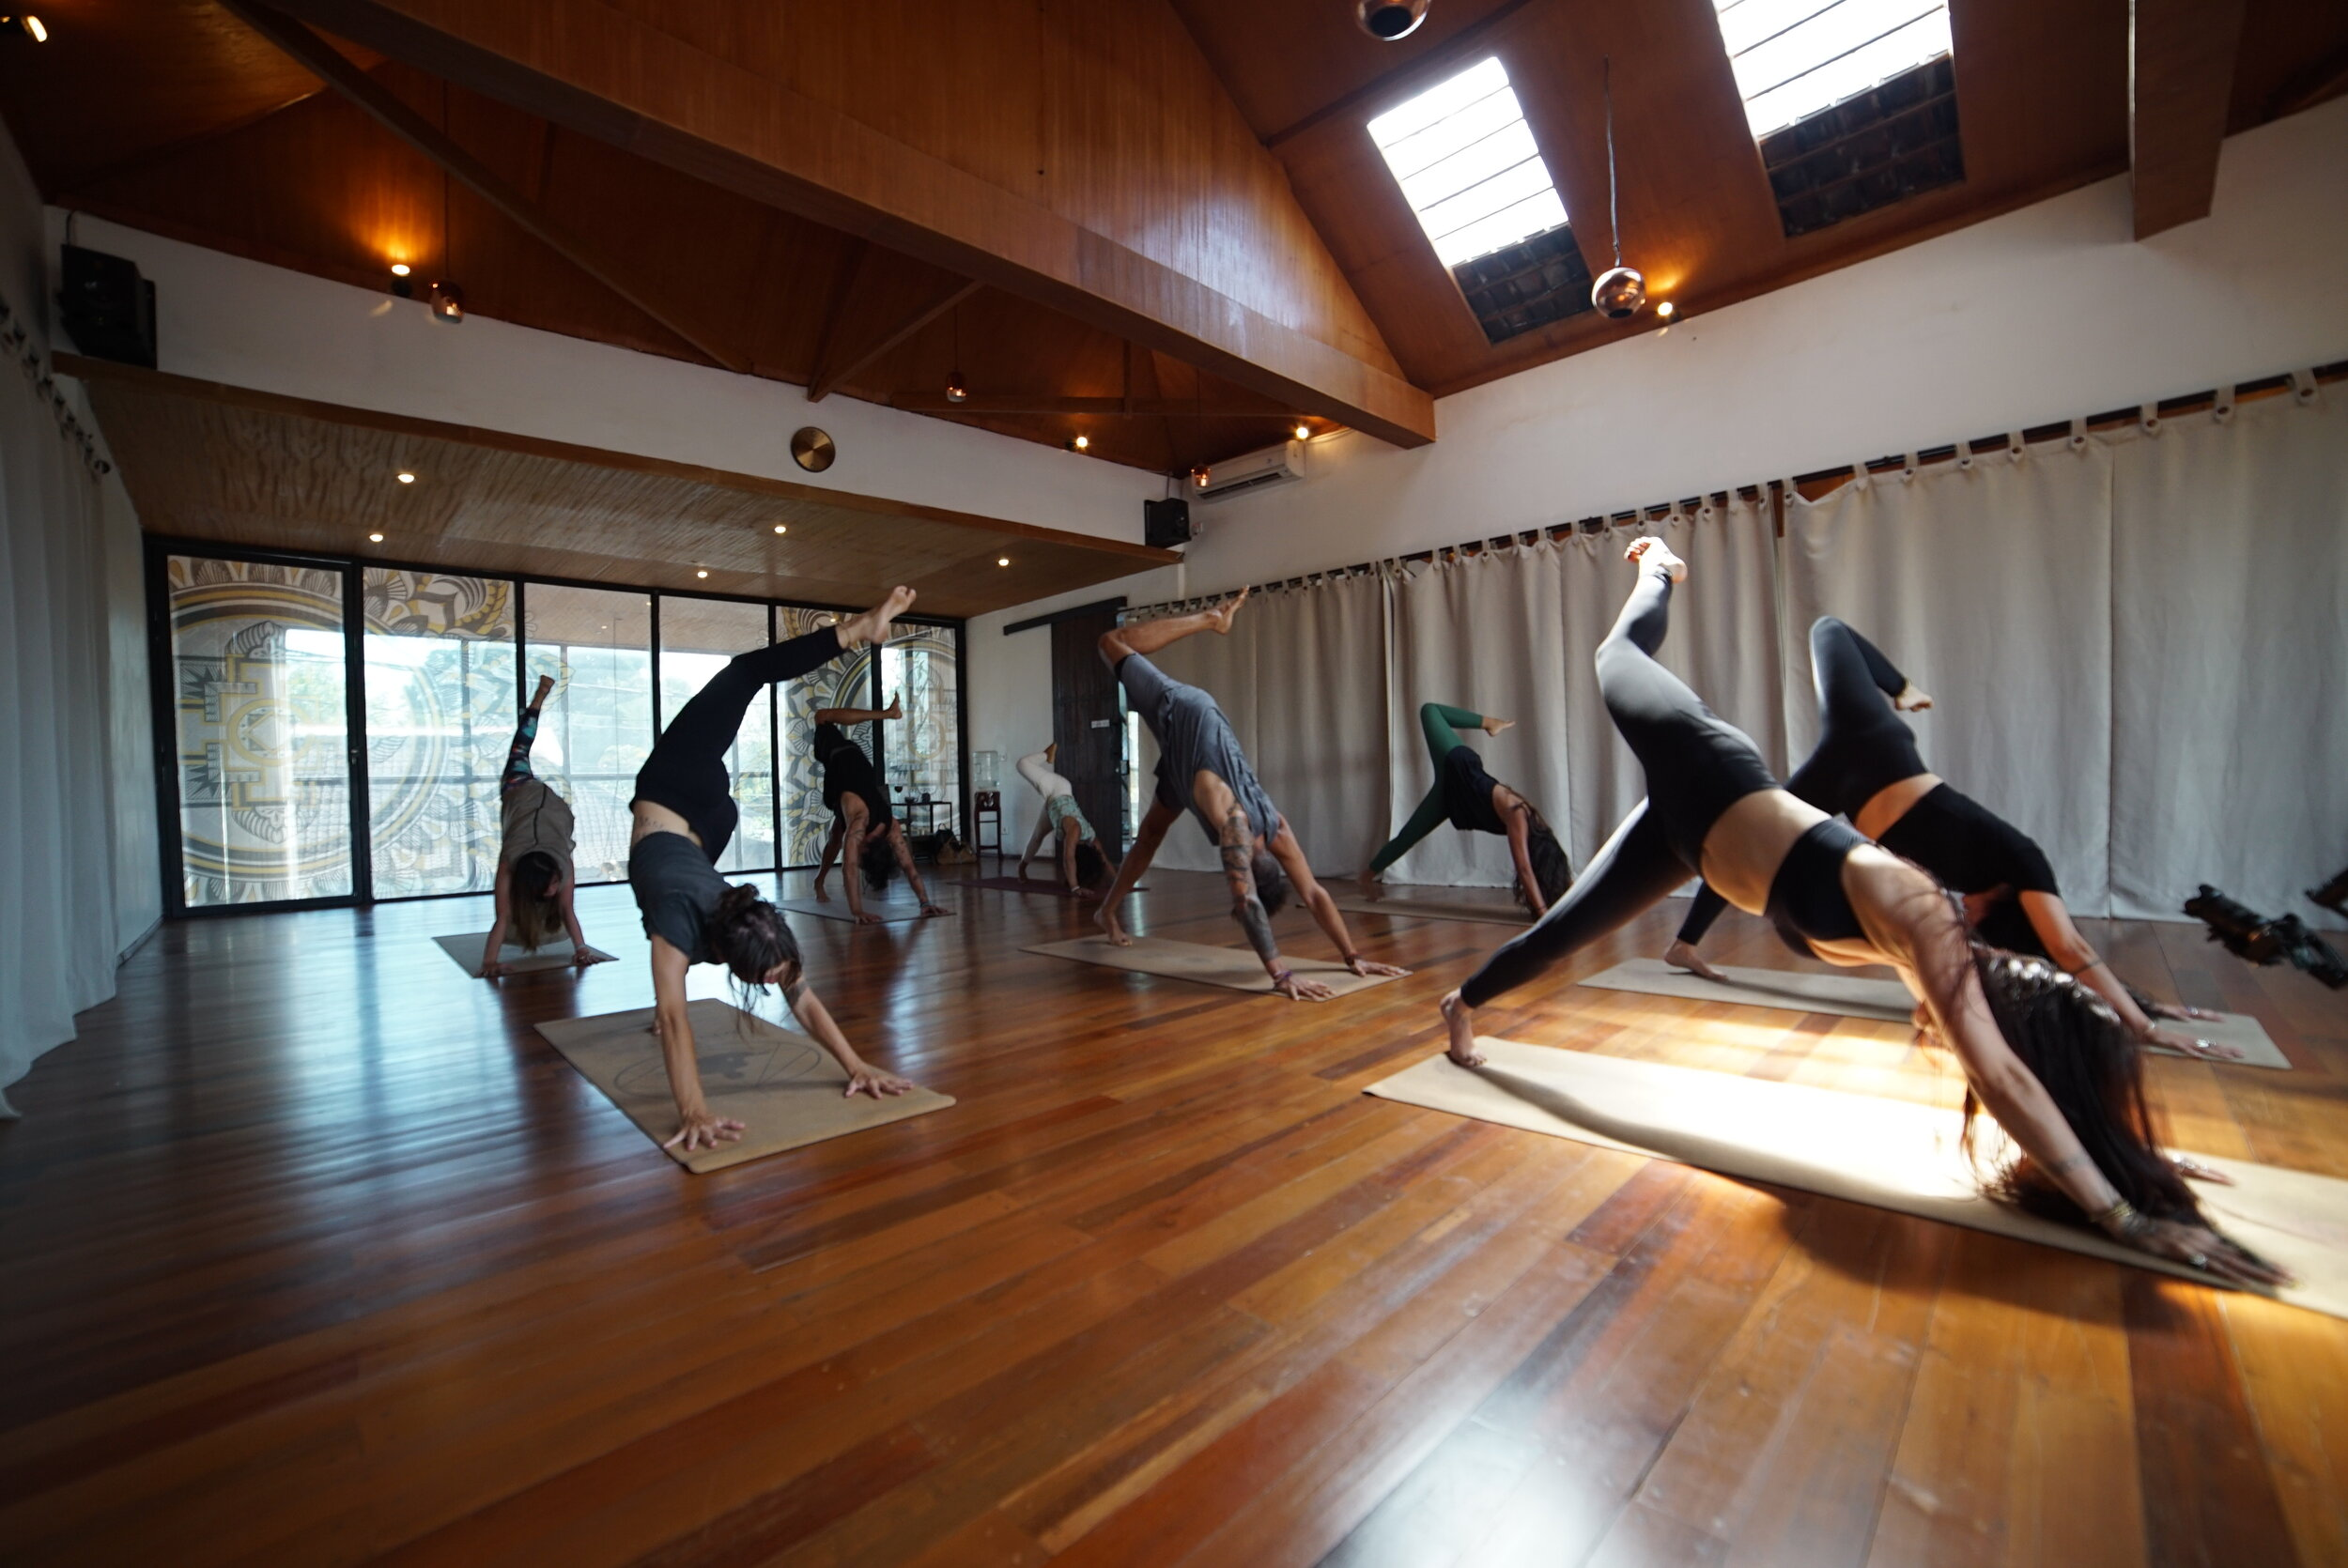 2019_05_04_Karma_House_Yoga_A7sii_118.JPG